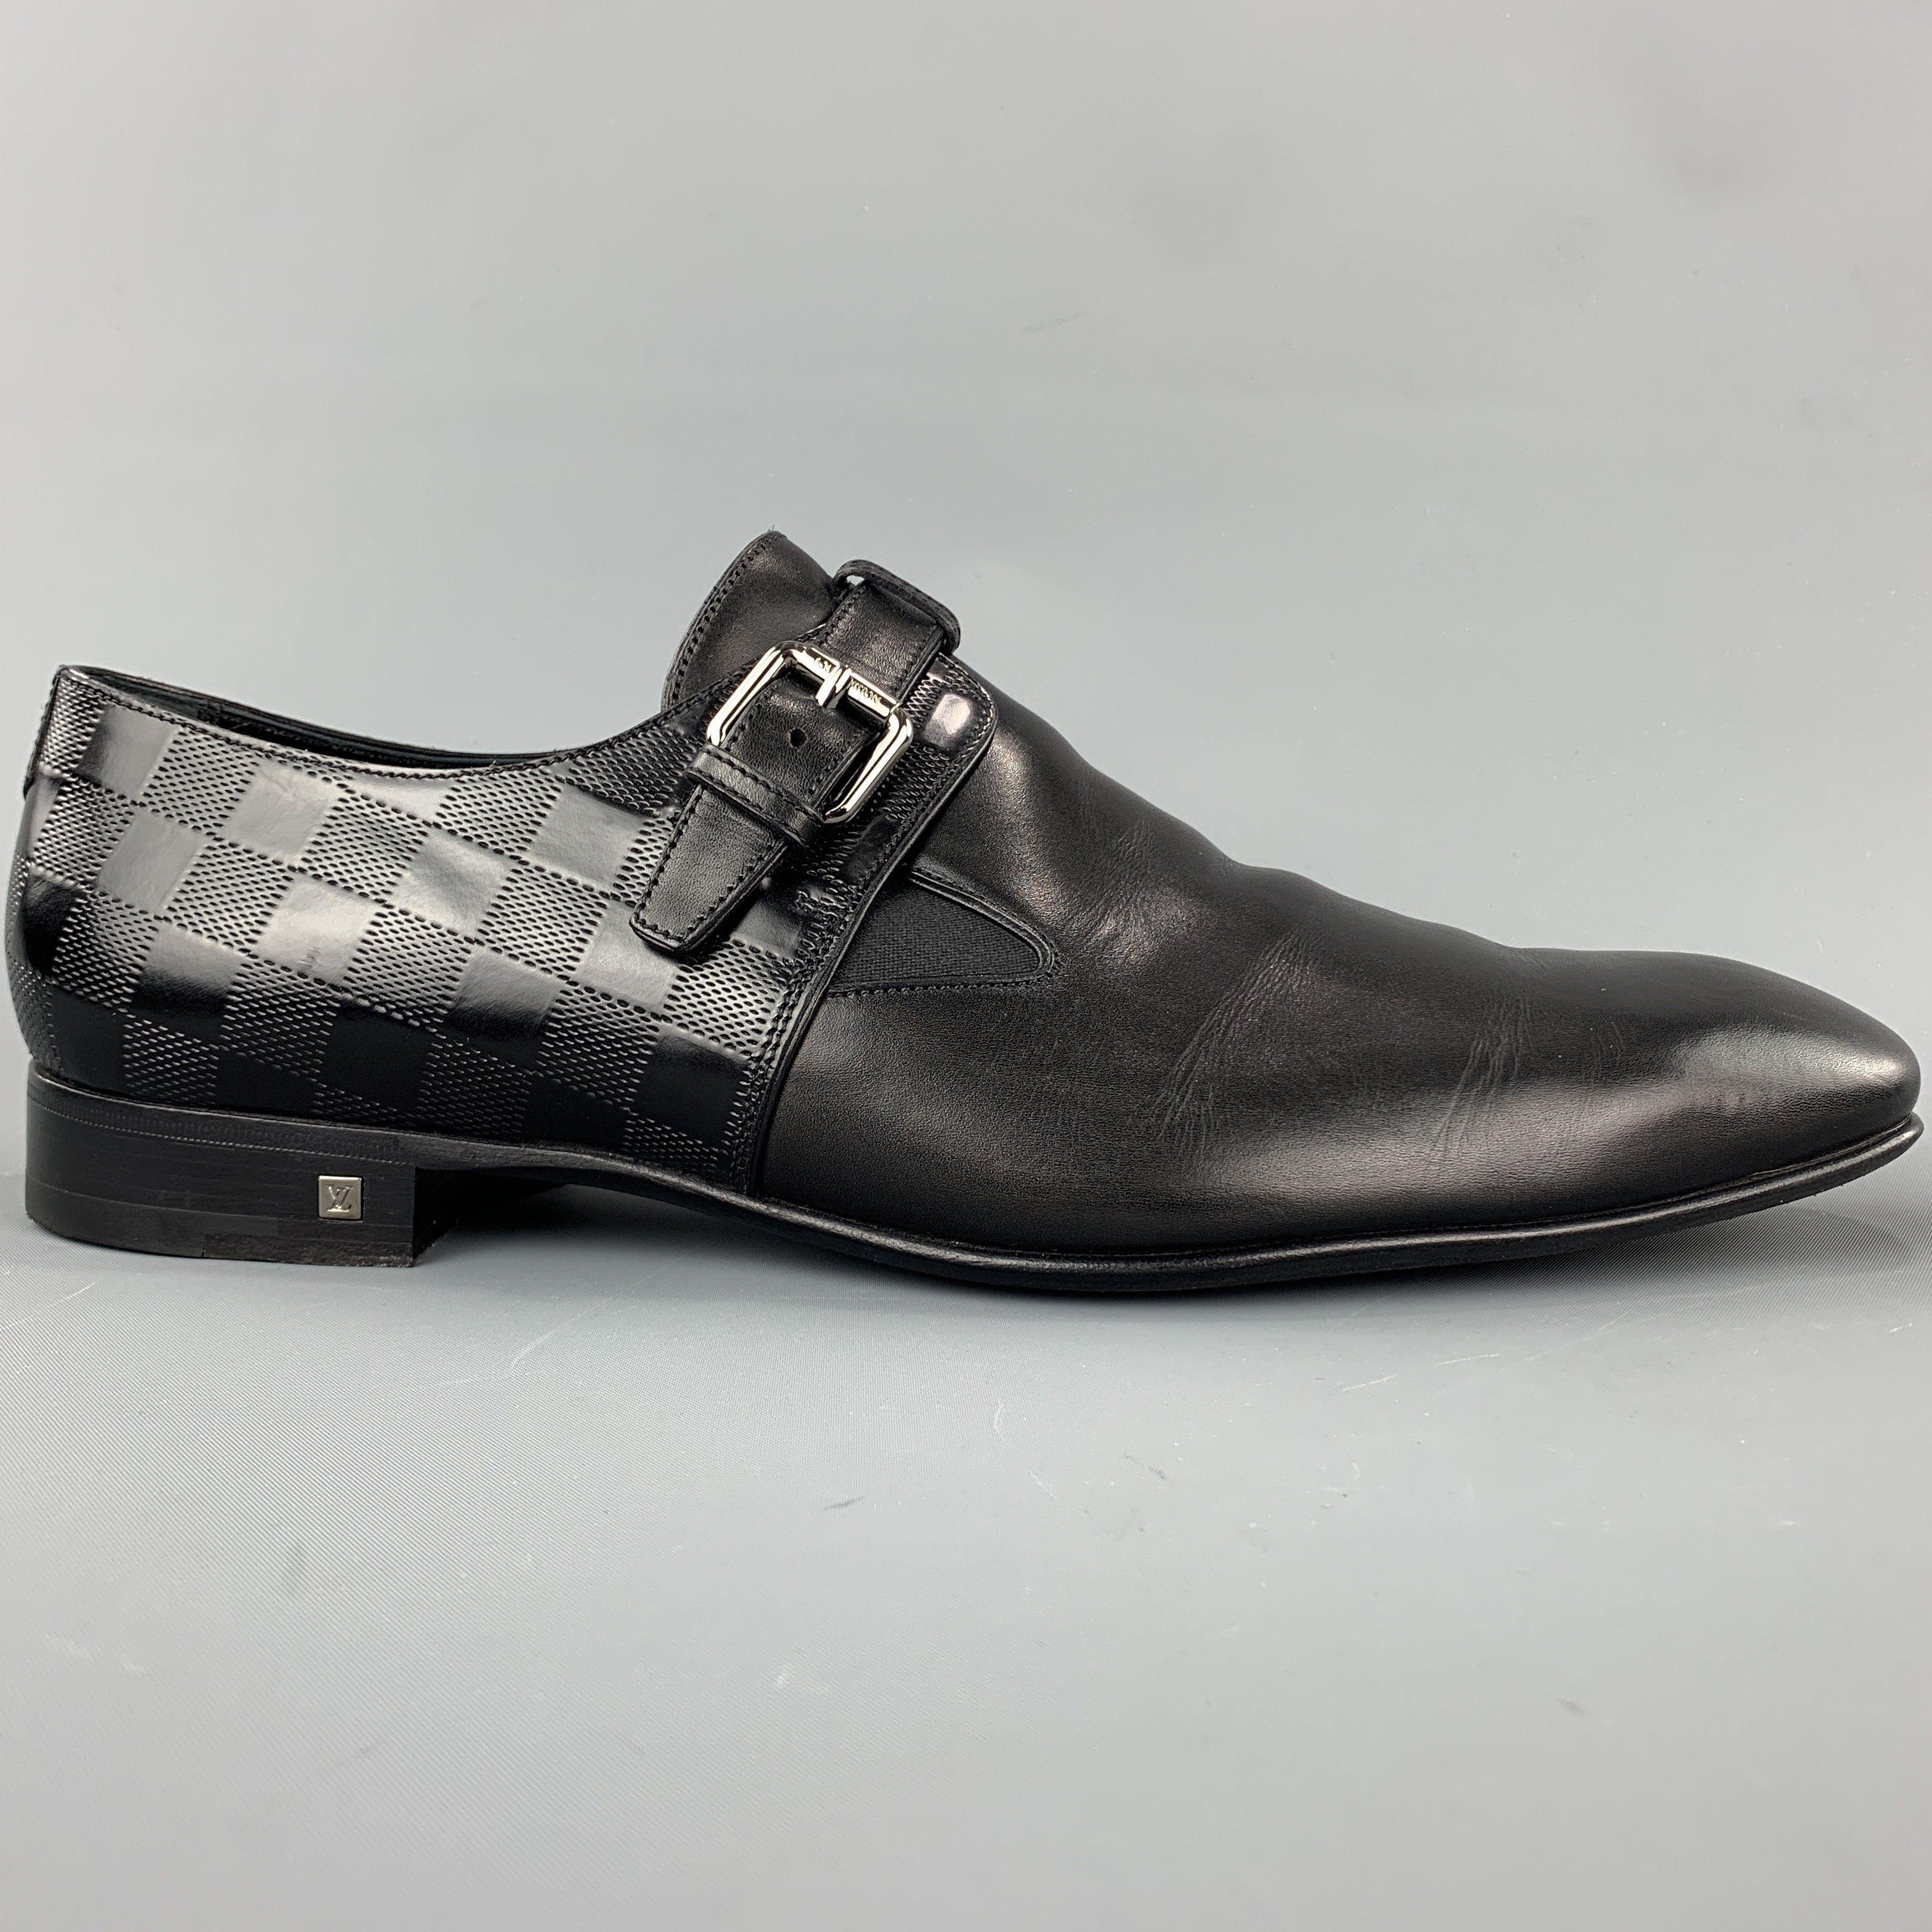 Leather Monk Strap Loafers   LePrix